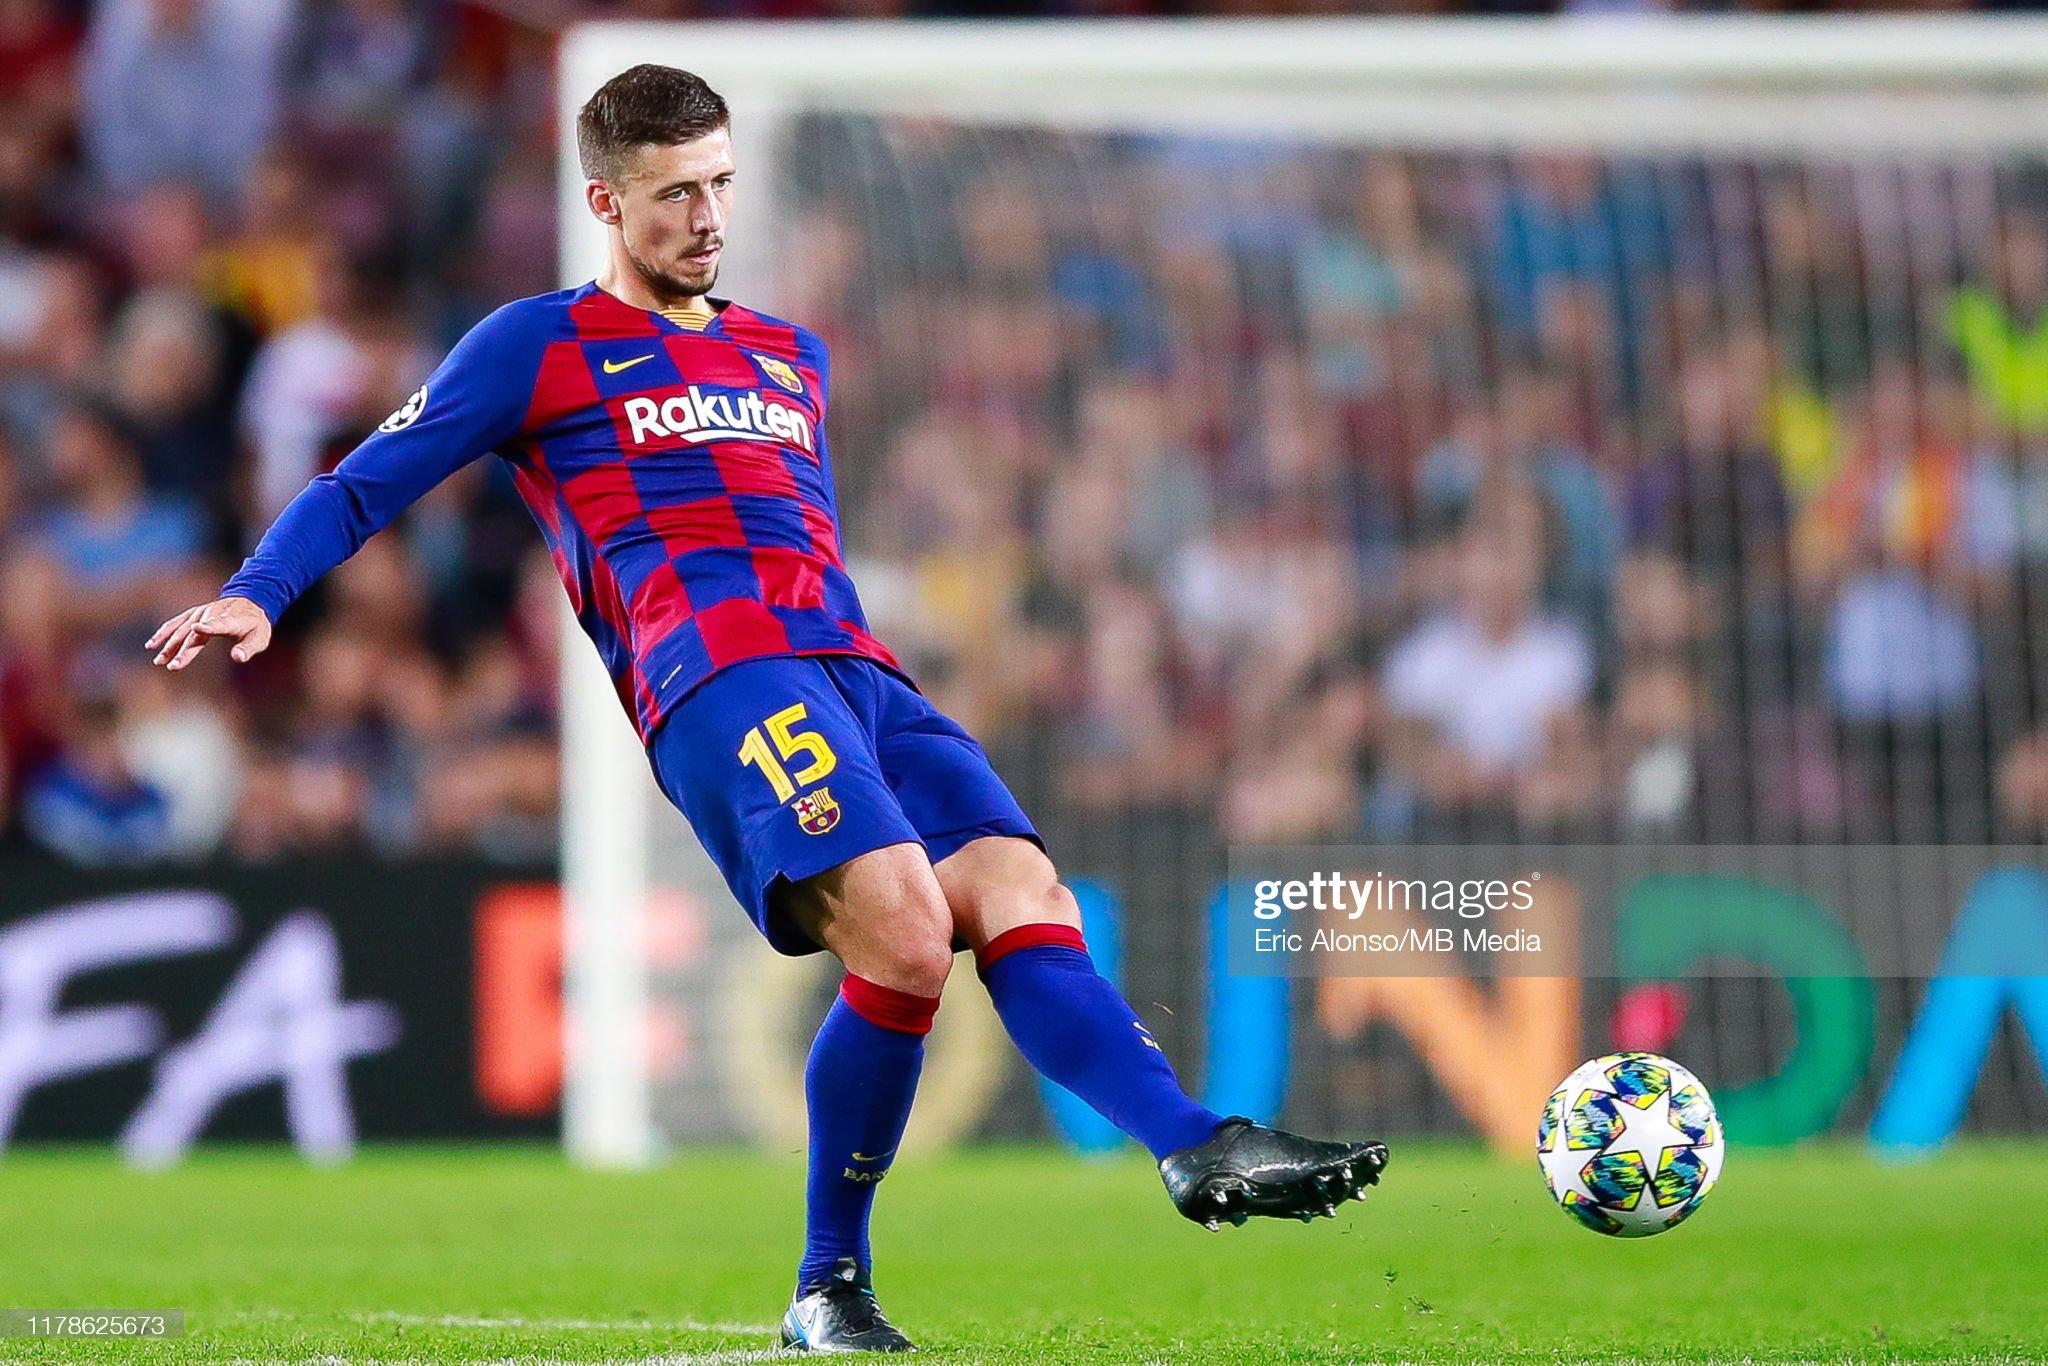 صور مباراة : برشلونة - إنتر 2-1 ( 02-10-2019 )  Clement-lenglet-of-fc-barcelona-passes-the-ball-during-the-uefa-f-picture-id1178625673?s=2048x2048